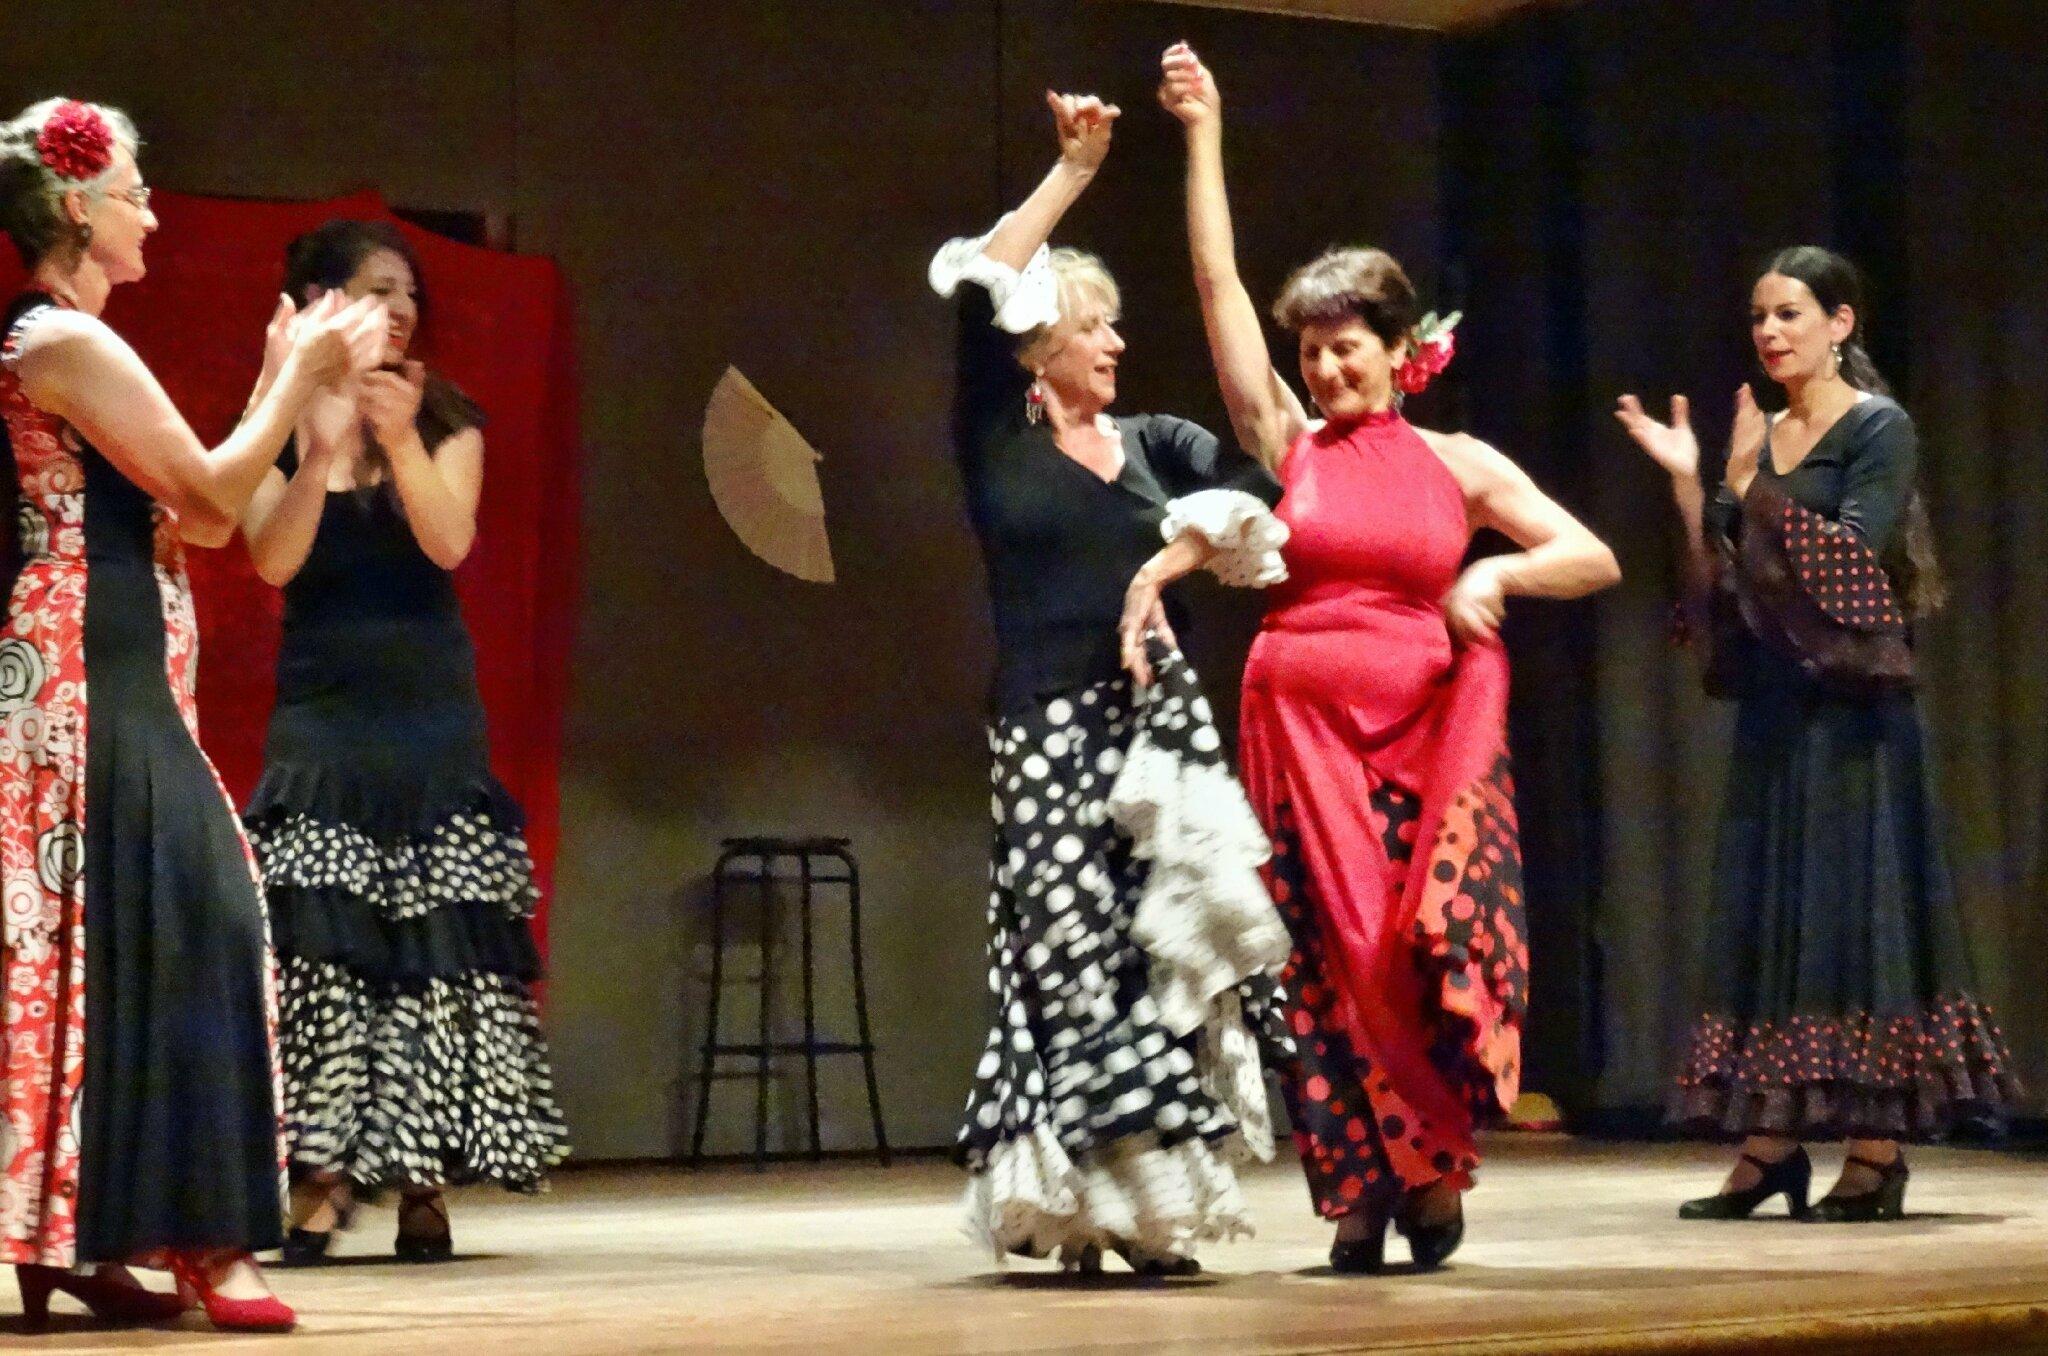 Gala SIN EMBARGO 28 juin 2015 Sainte-Croix-du-Mont (52)